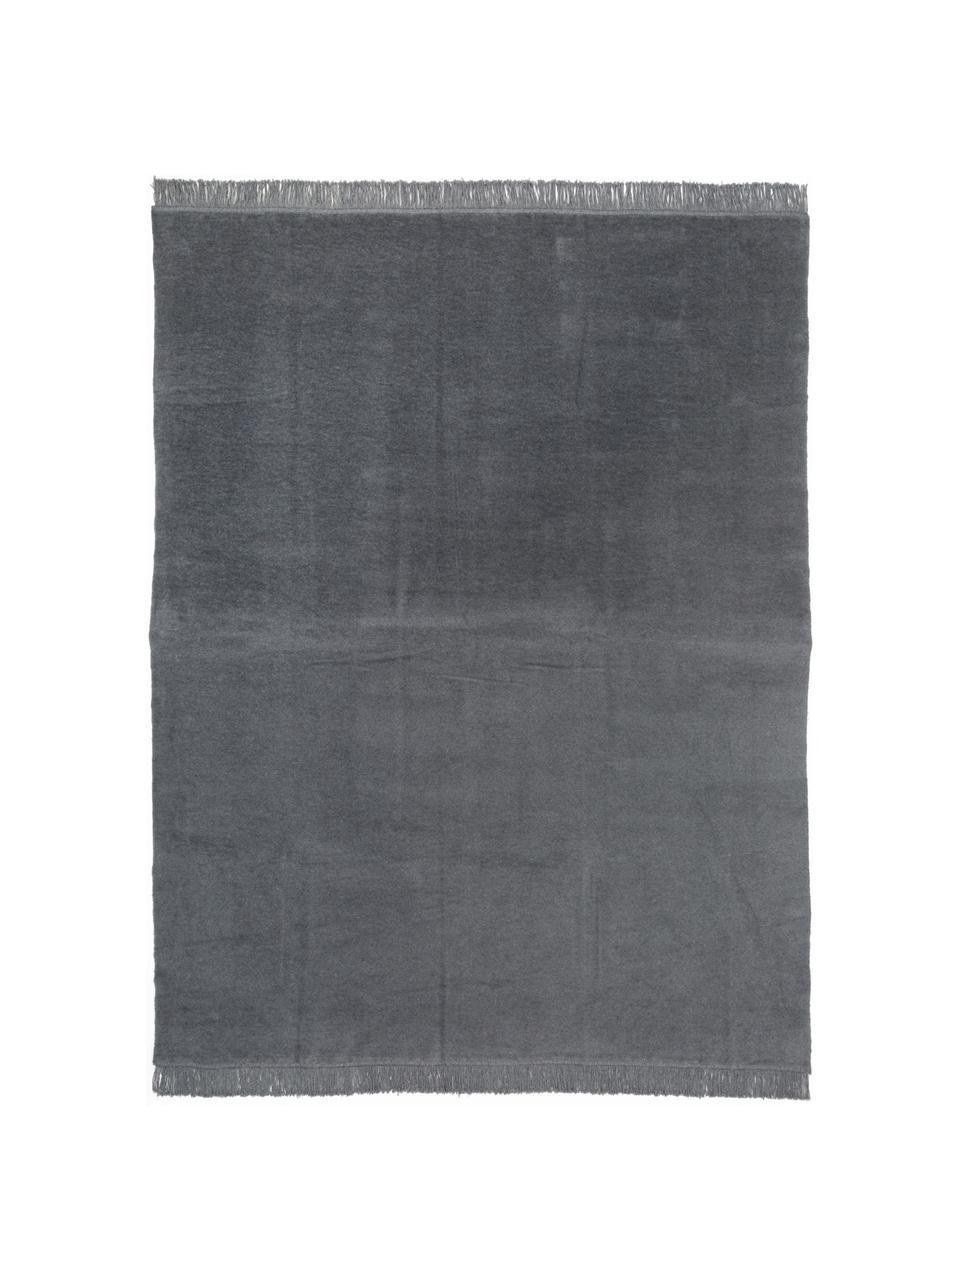 Manta Sydney, Gris oscuro, An 150 x L 200 cm